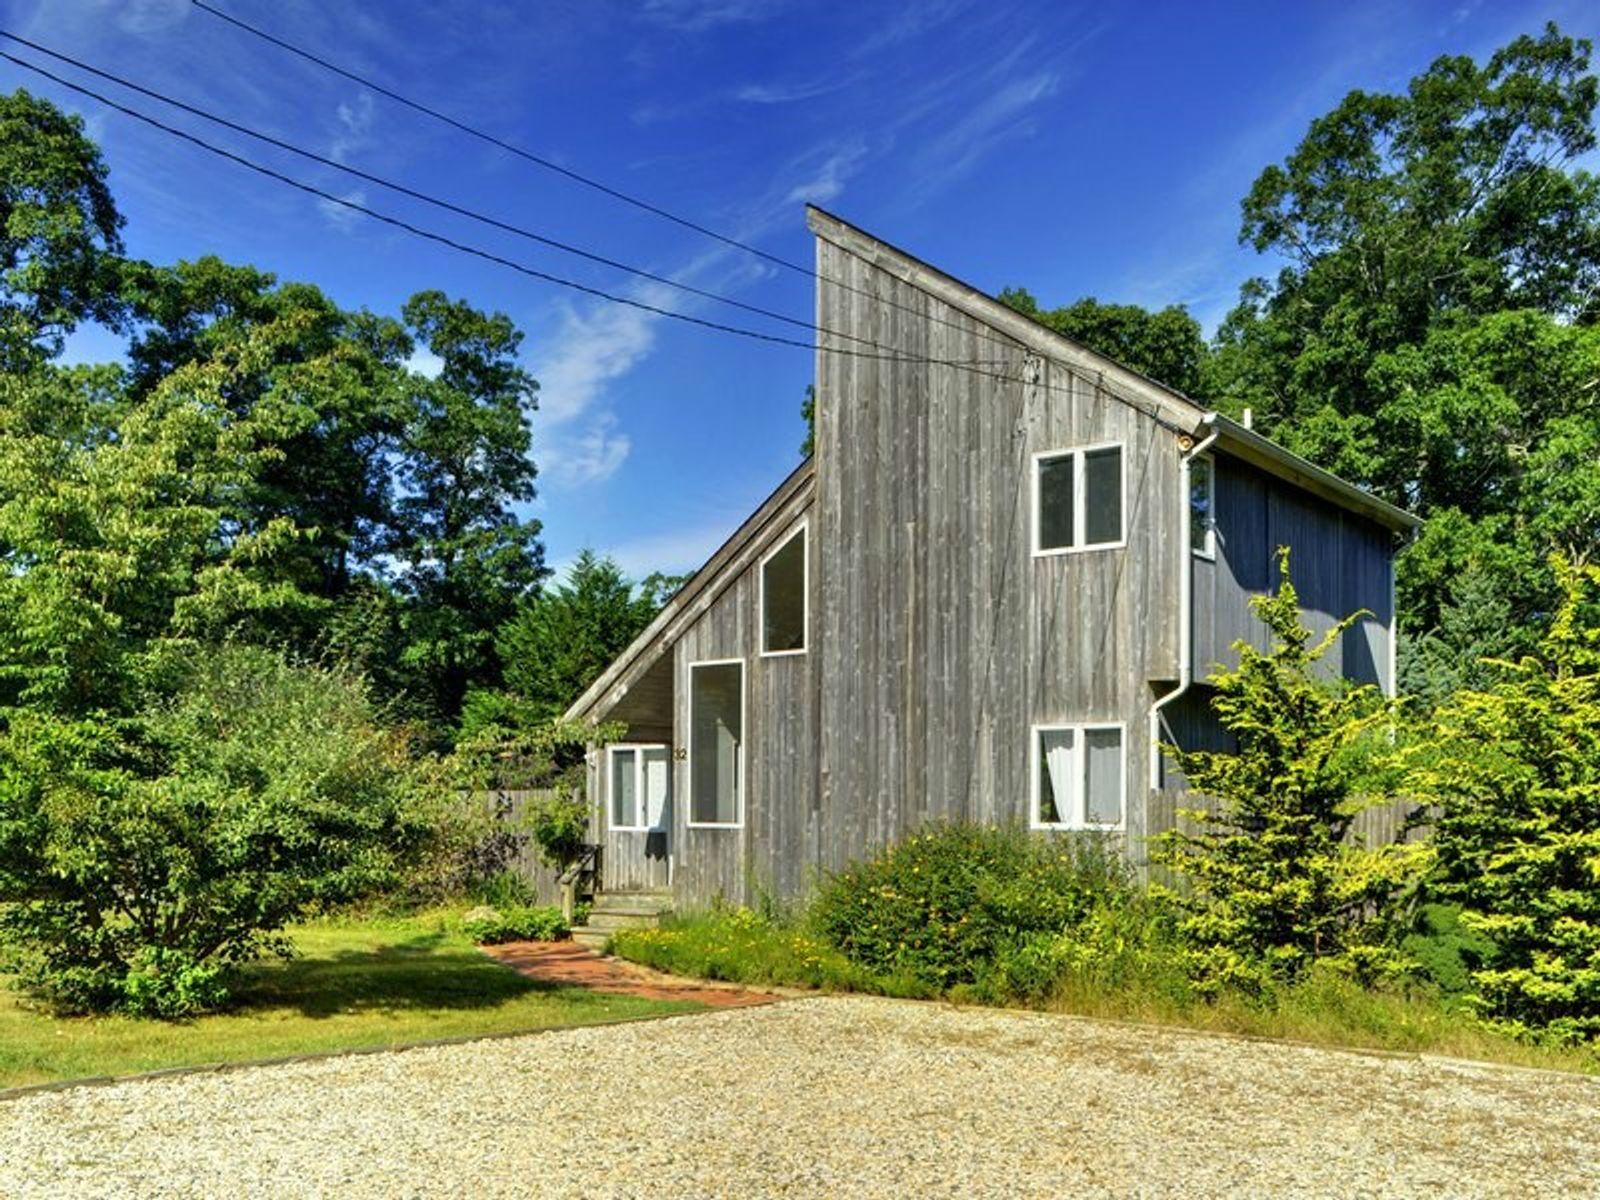 Modern saltbox east hampton ny single family home for Homes for sale east hampton ny